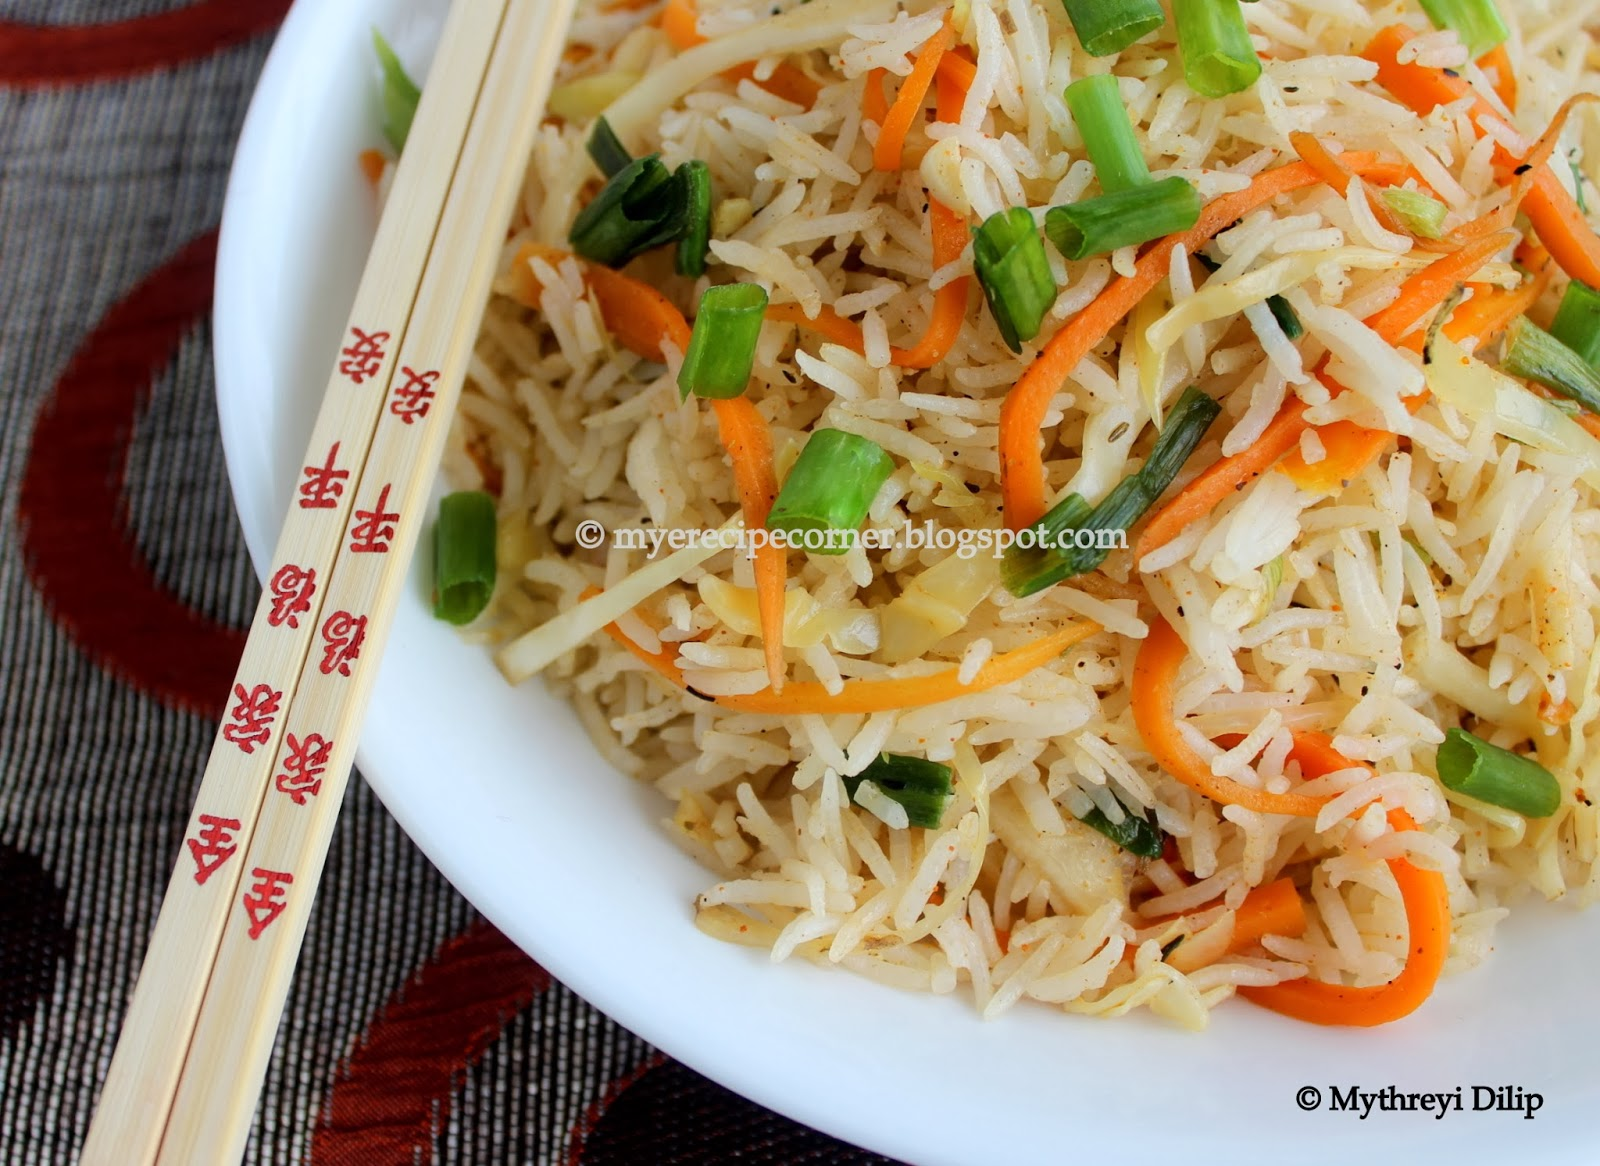 Myes kitchen manchow fried rice recipe wangs kitchen restaurant vegetarian manchow rice recipe ccuart Choice Image